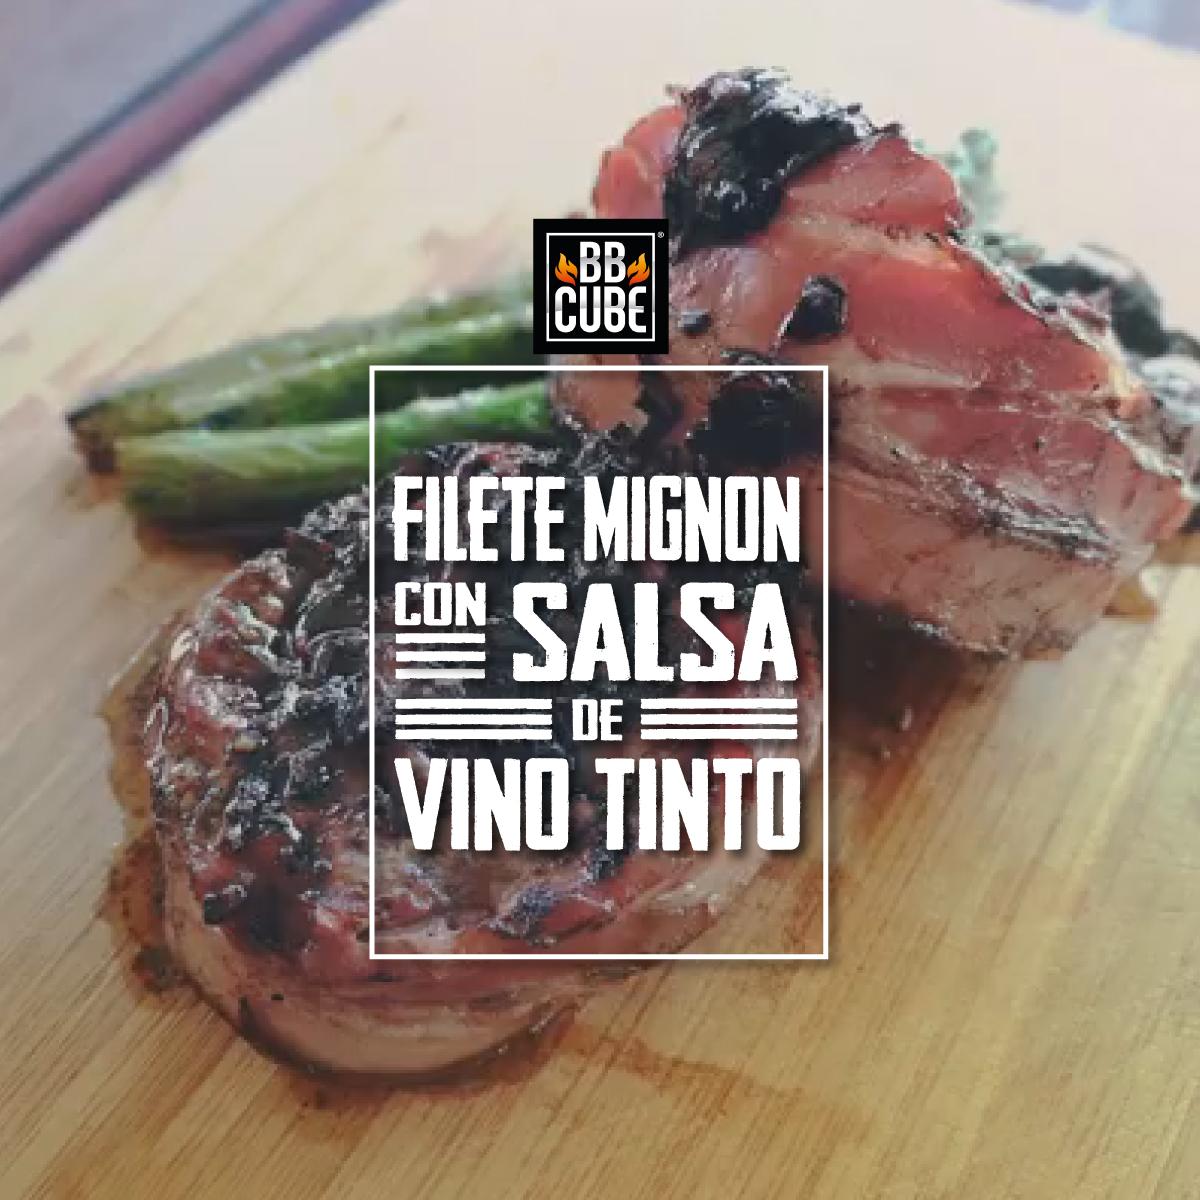 Filete-Mignon-con-Salsa-de-Vino-Tinto